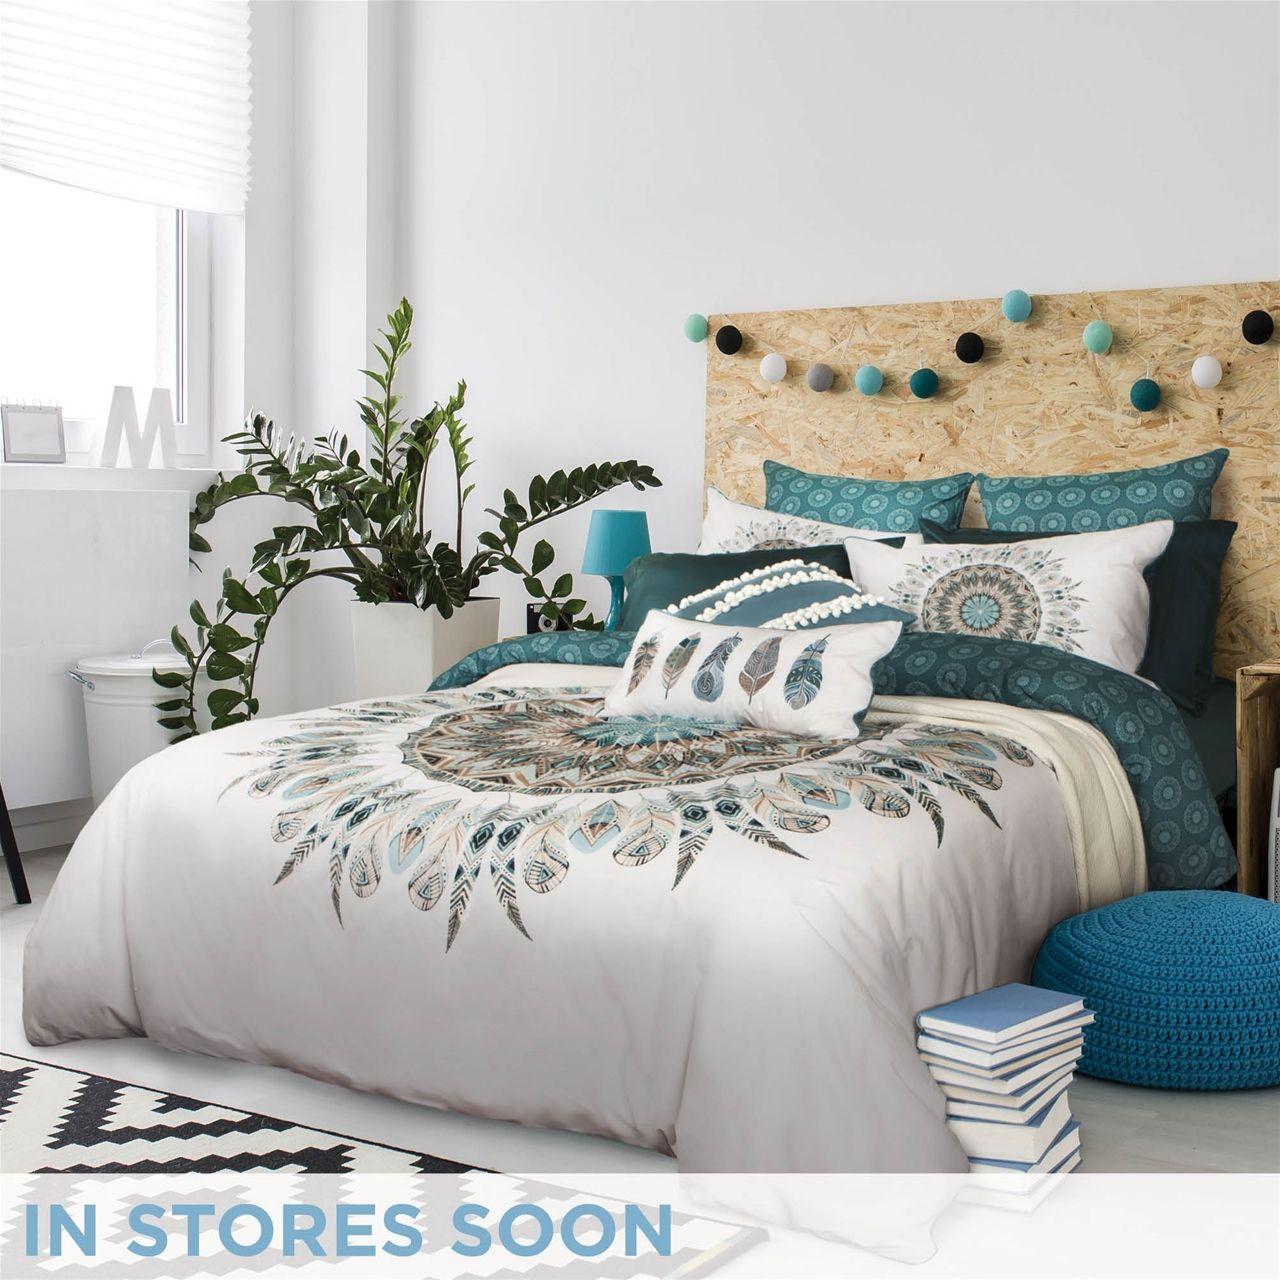 Shop Qe Home Quilts Etc For Exclusive Luxury Linens Bedding